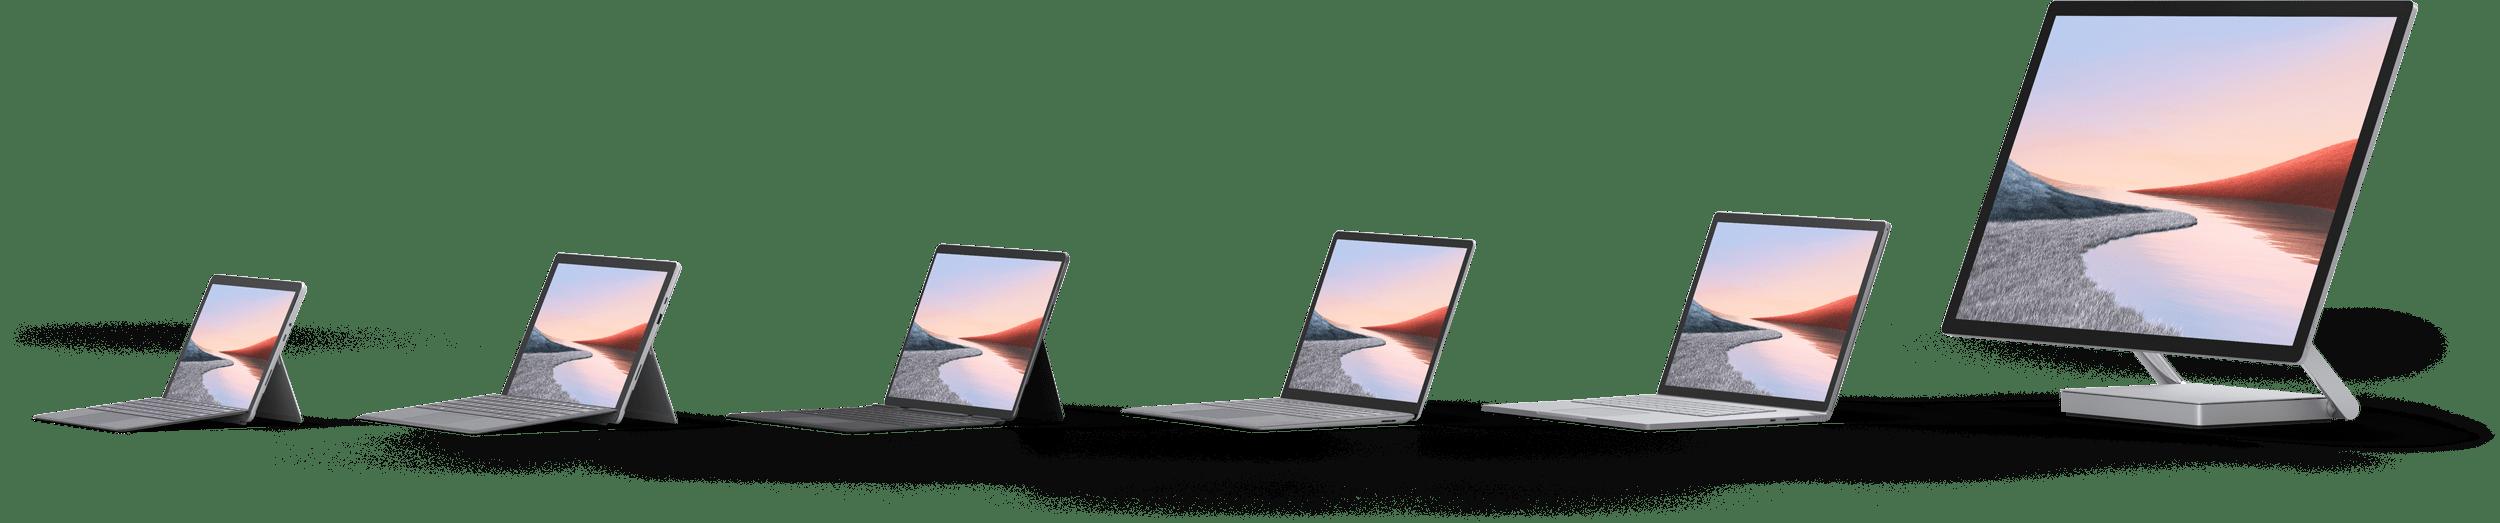 Microsoft Surface | VanRoey.be